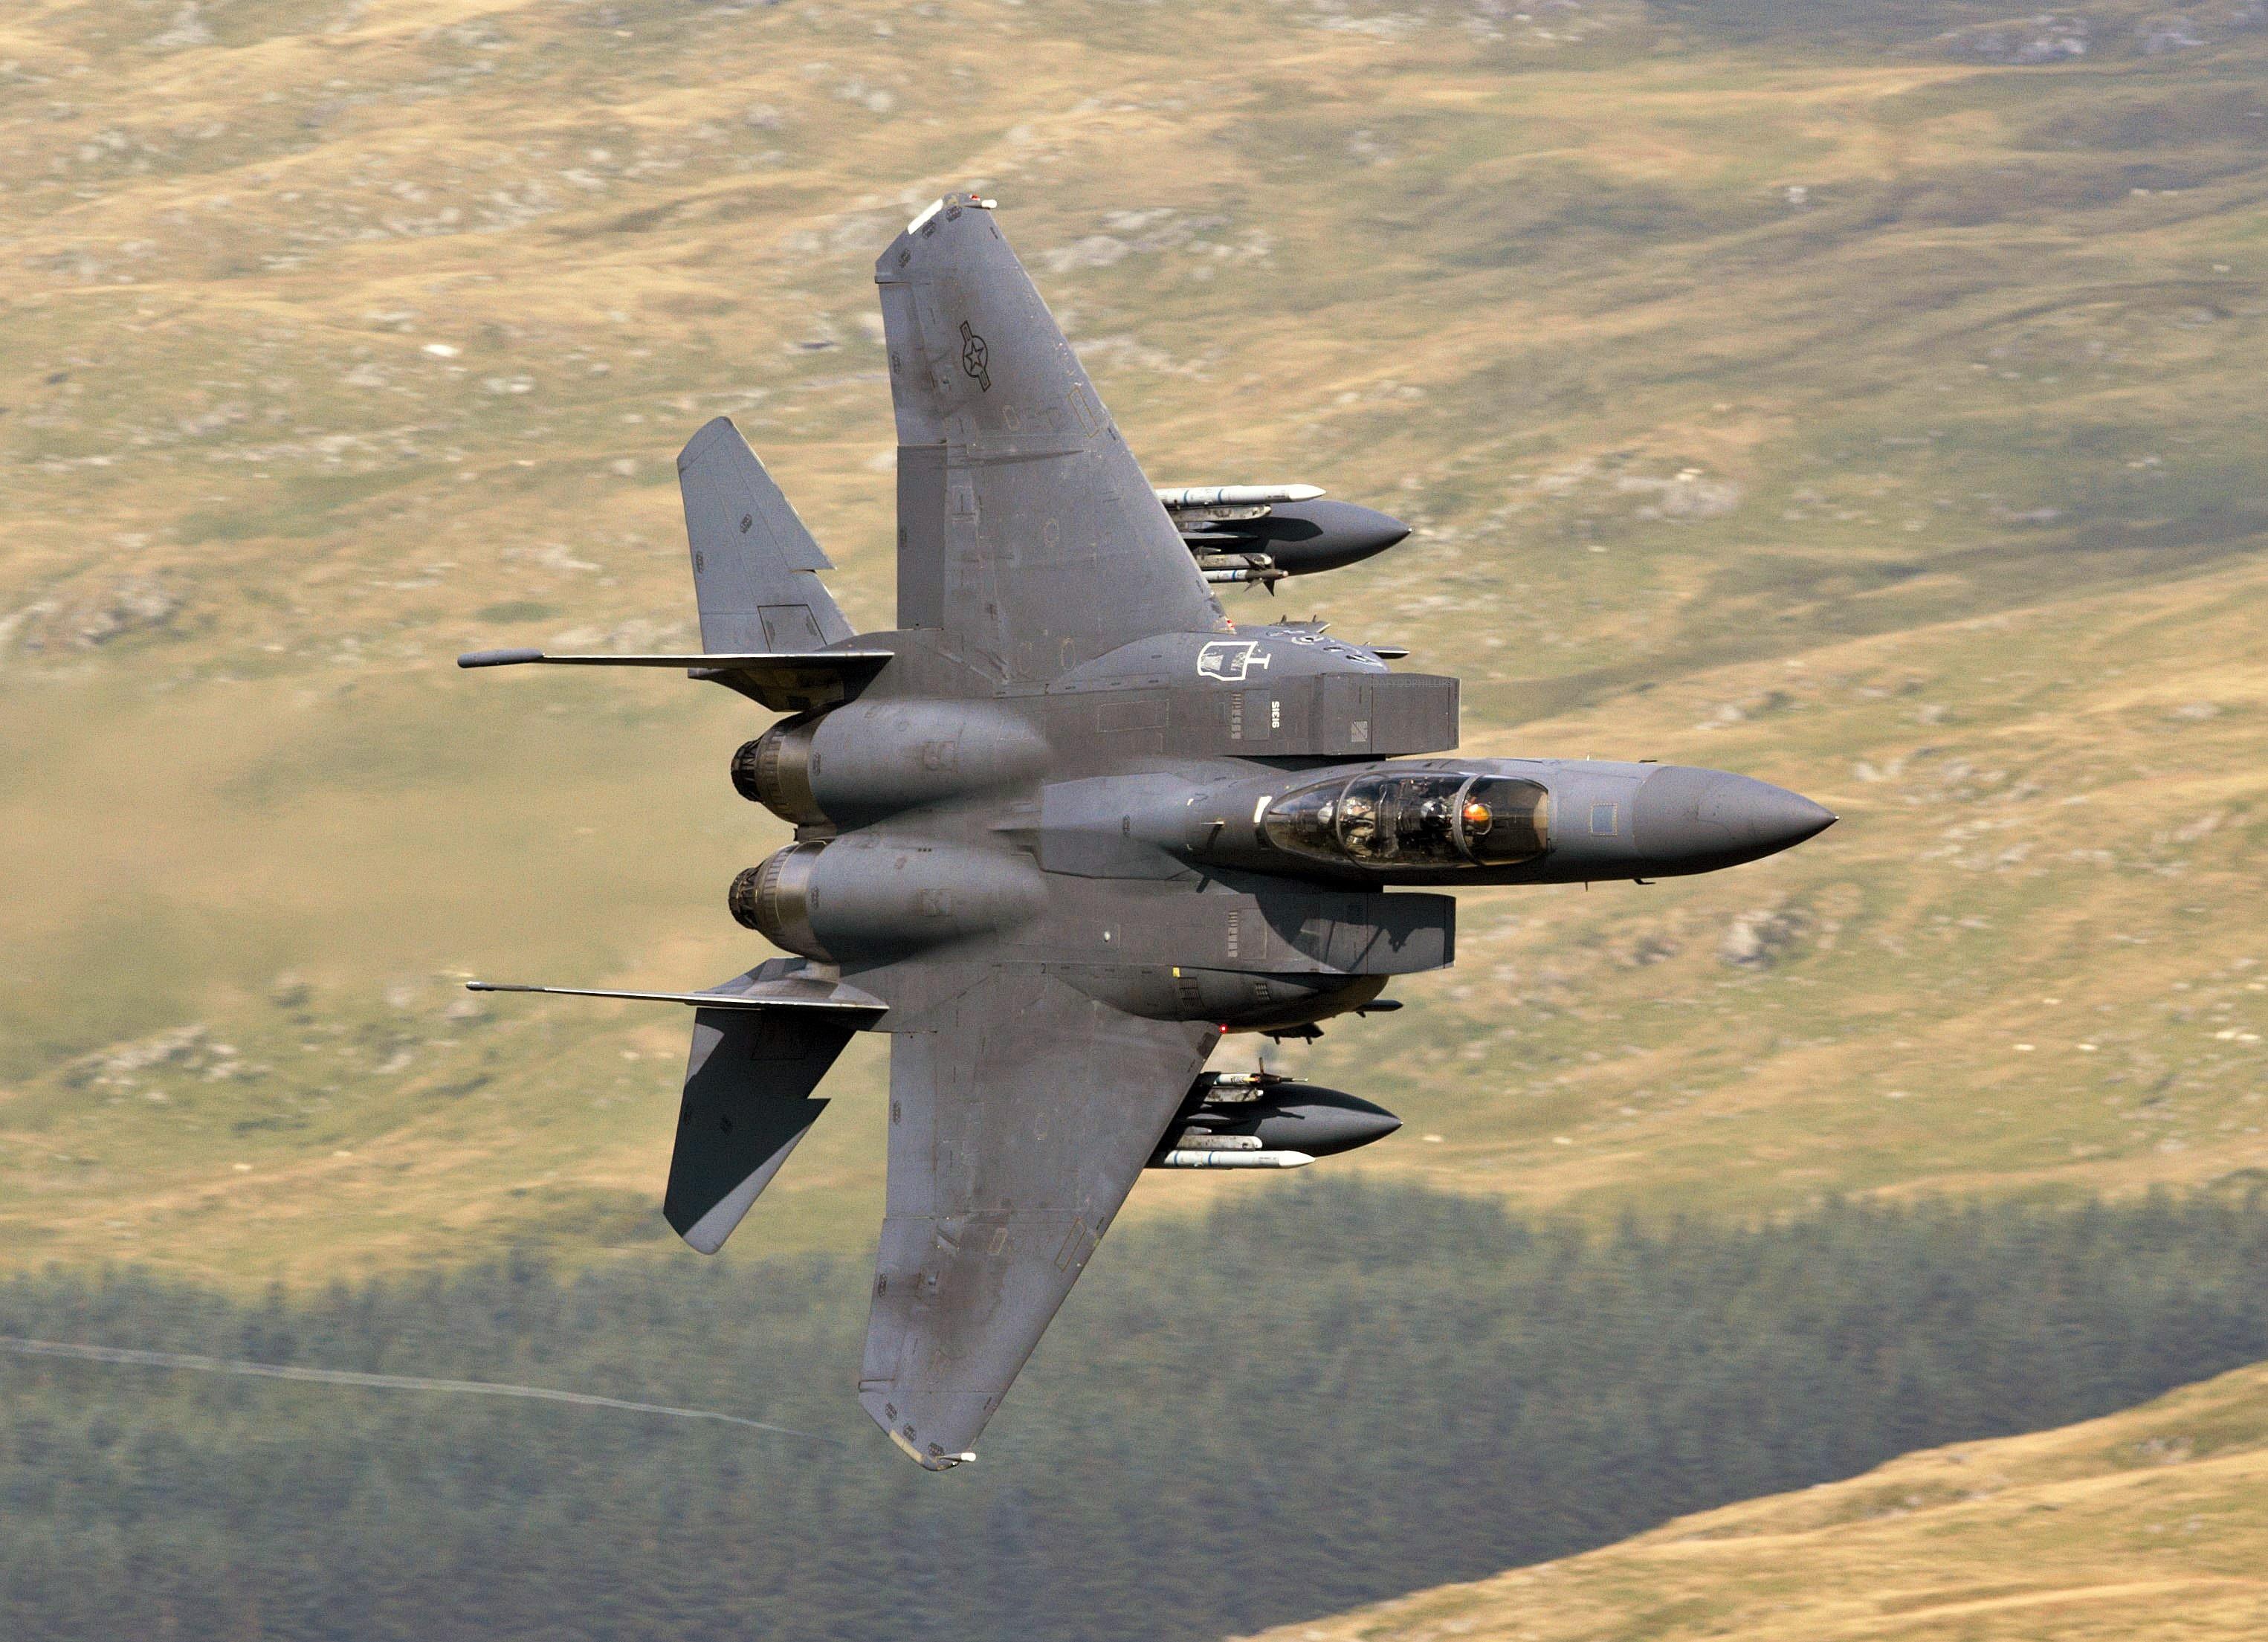 wallpaper : airplane, military aircraft, usa, eagle, grumman f 14